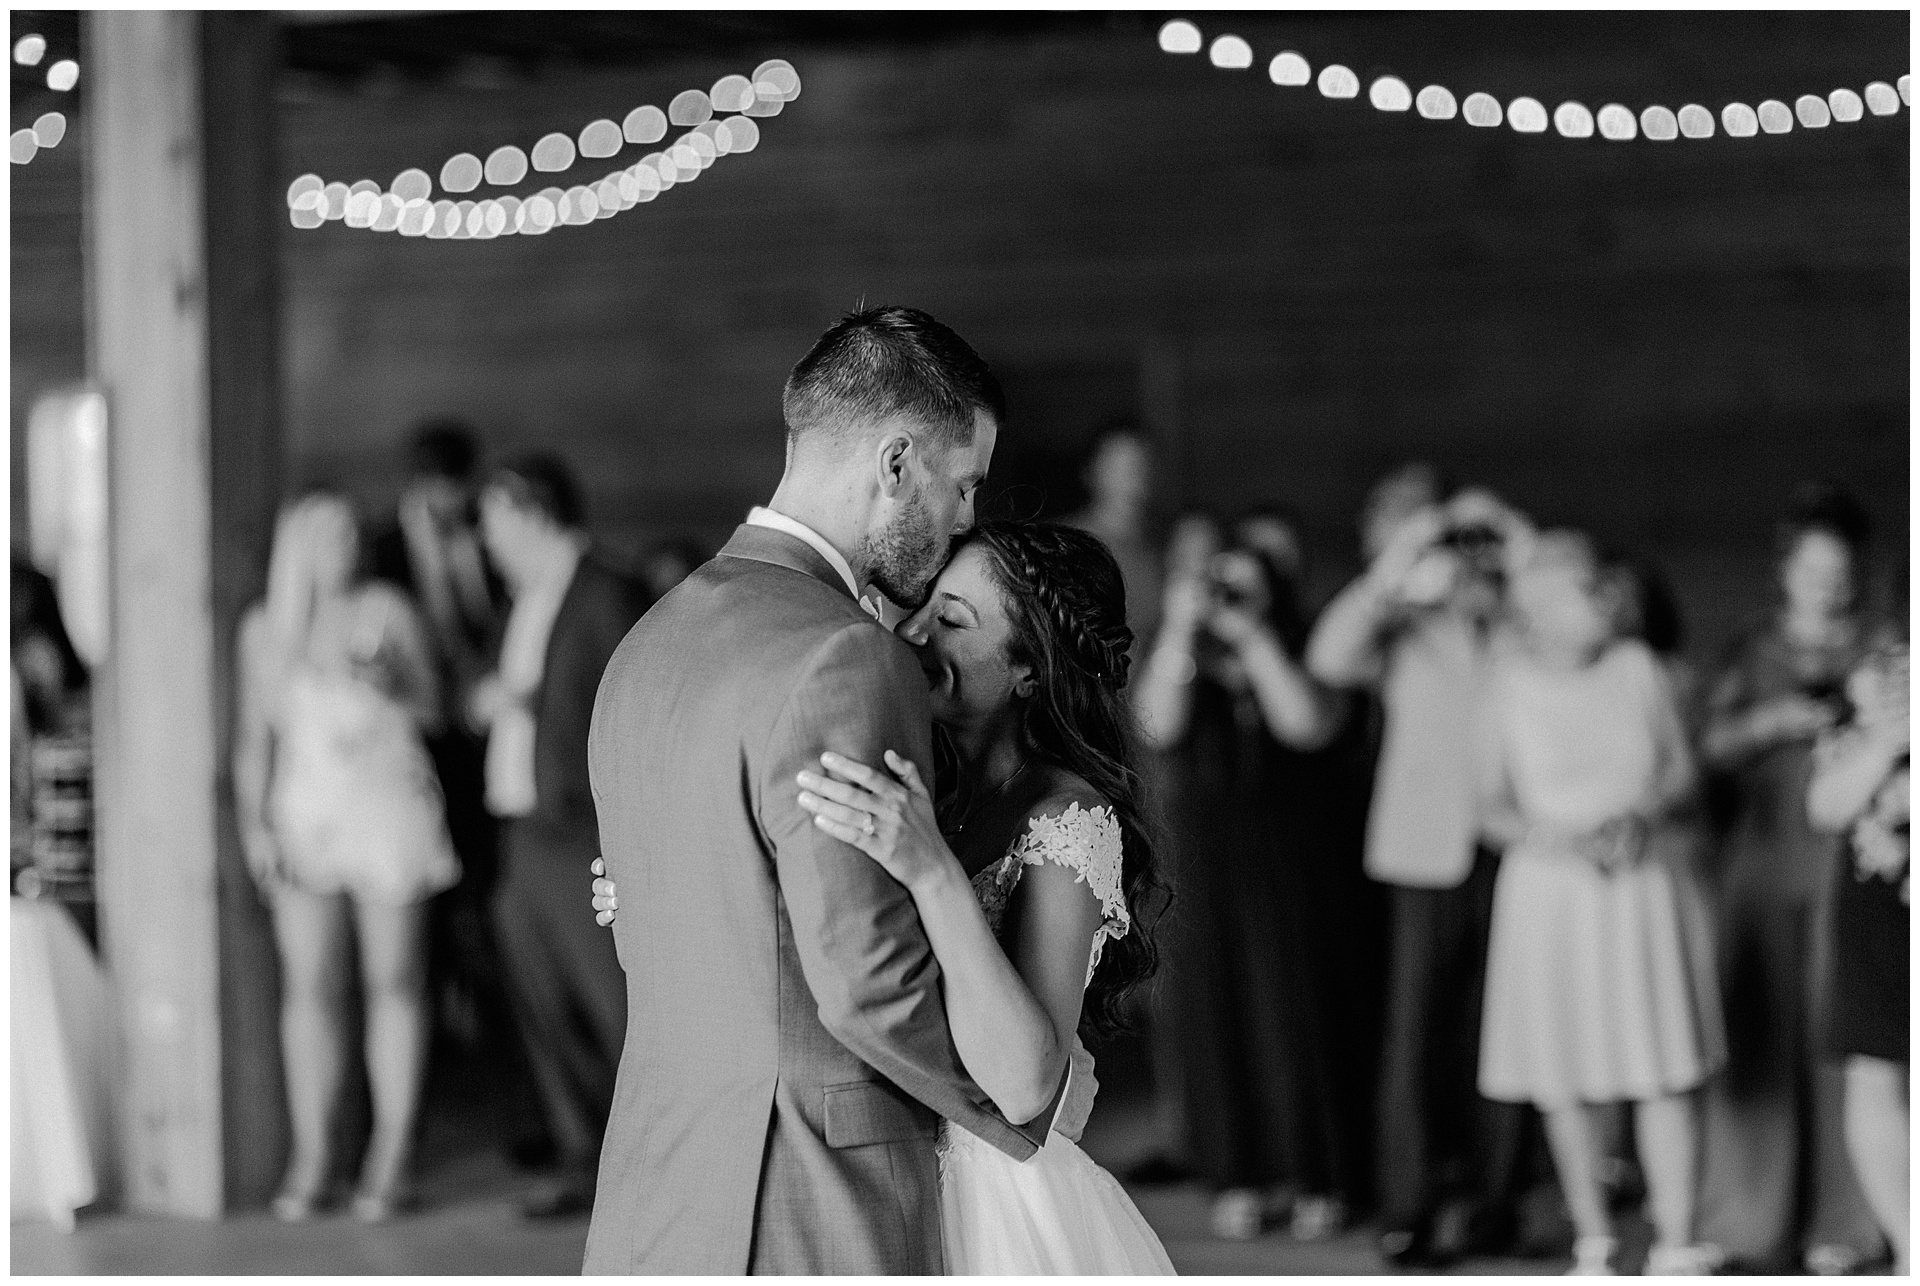 st augustine wedding photographer_mia dimare photography43.jpg